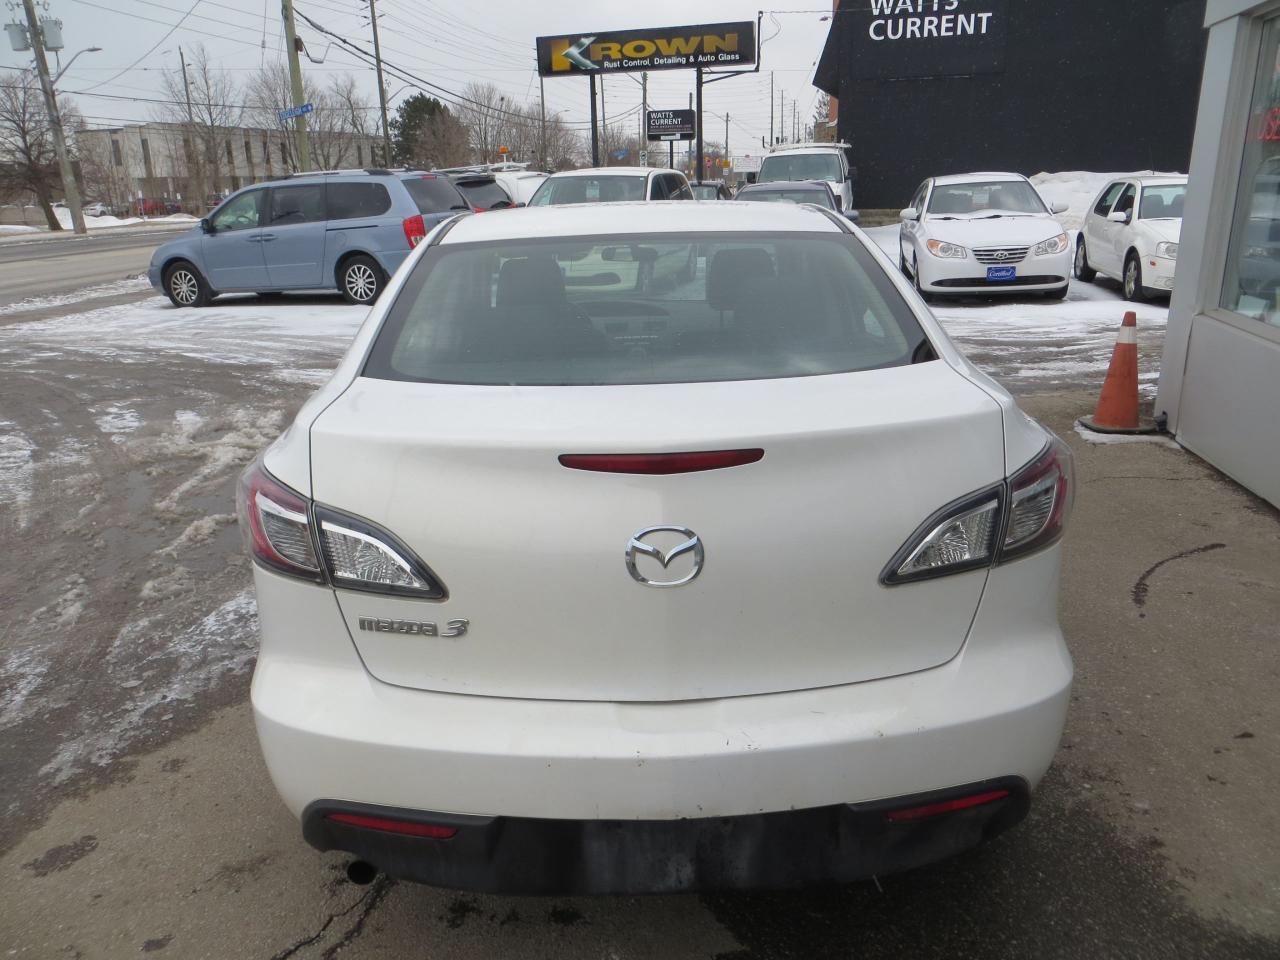 2011 Mazda MAZDA3 AUTOMATIC,CLEAN CARFAX,A/C,ALL POWER,ALLOYS